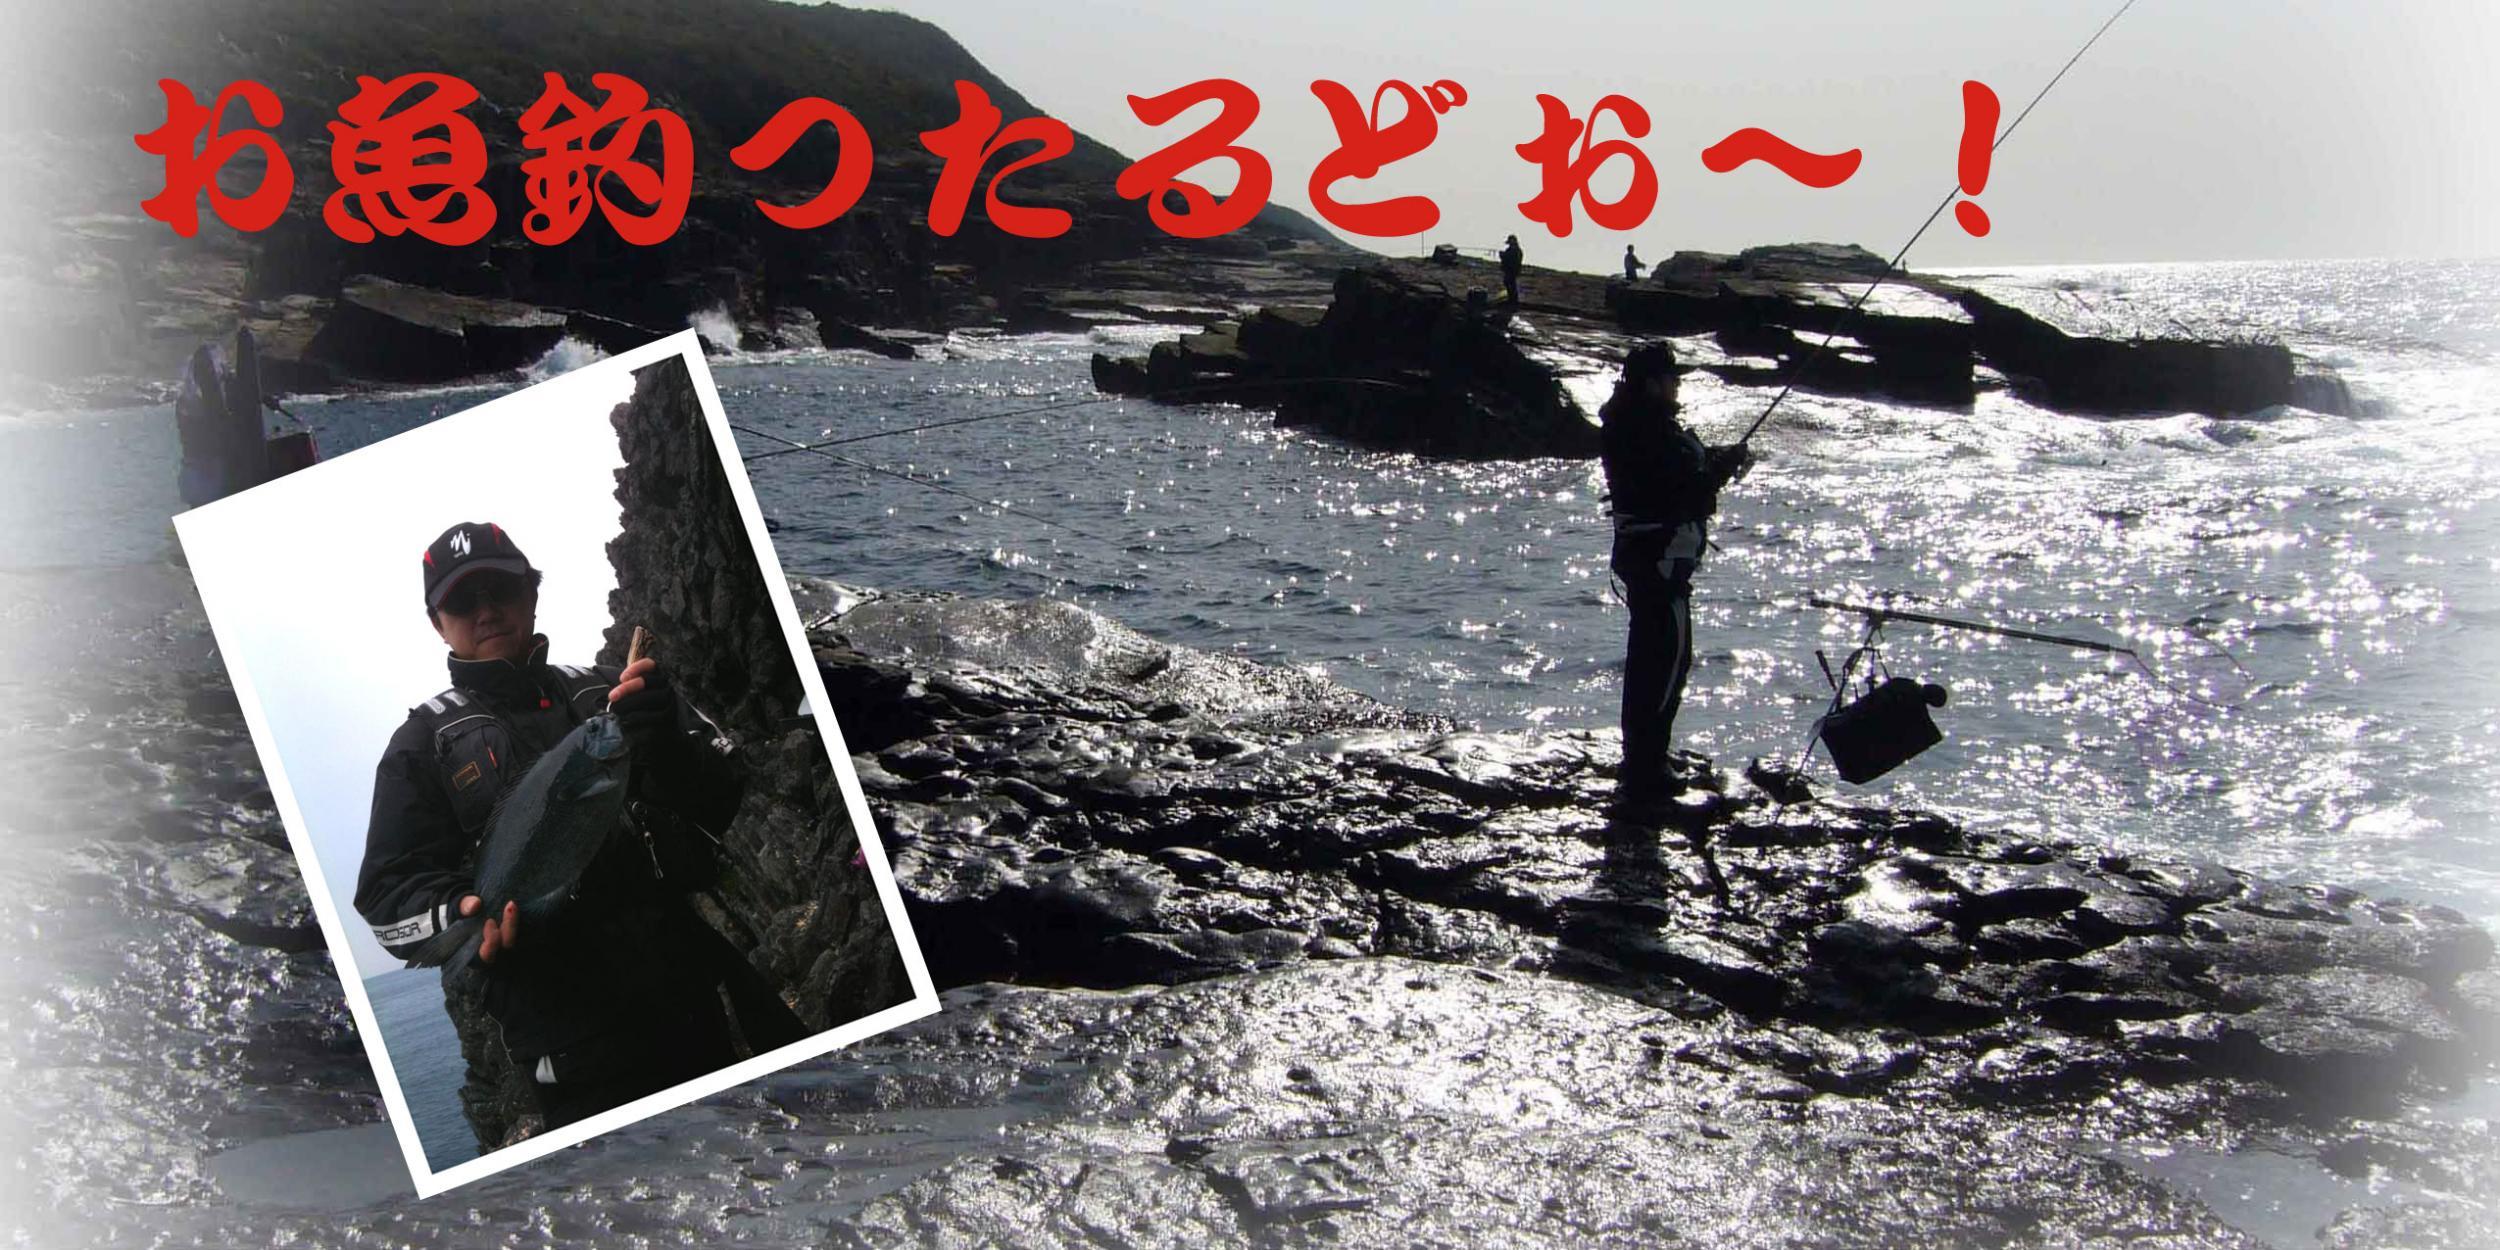 SUNLINE がまかつ DAIWA 磯釣り グレ チヌ